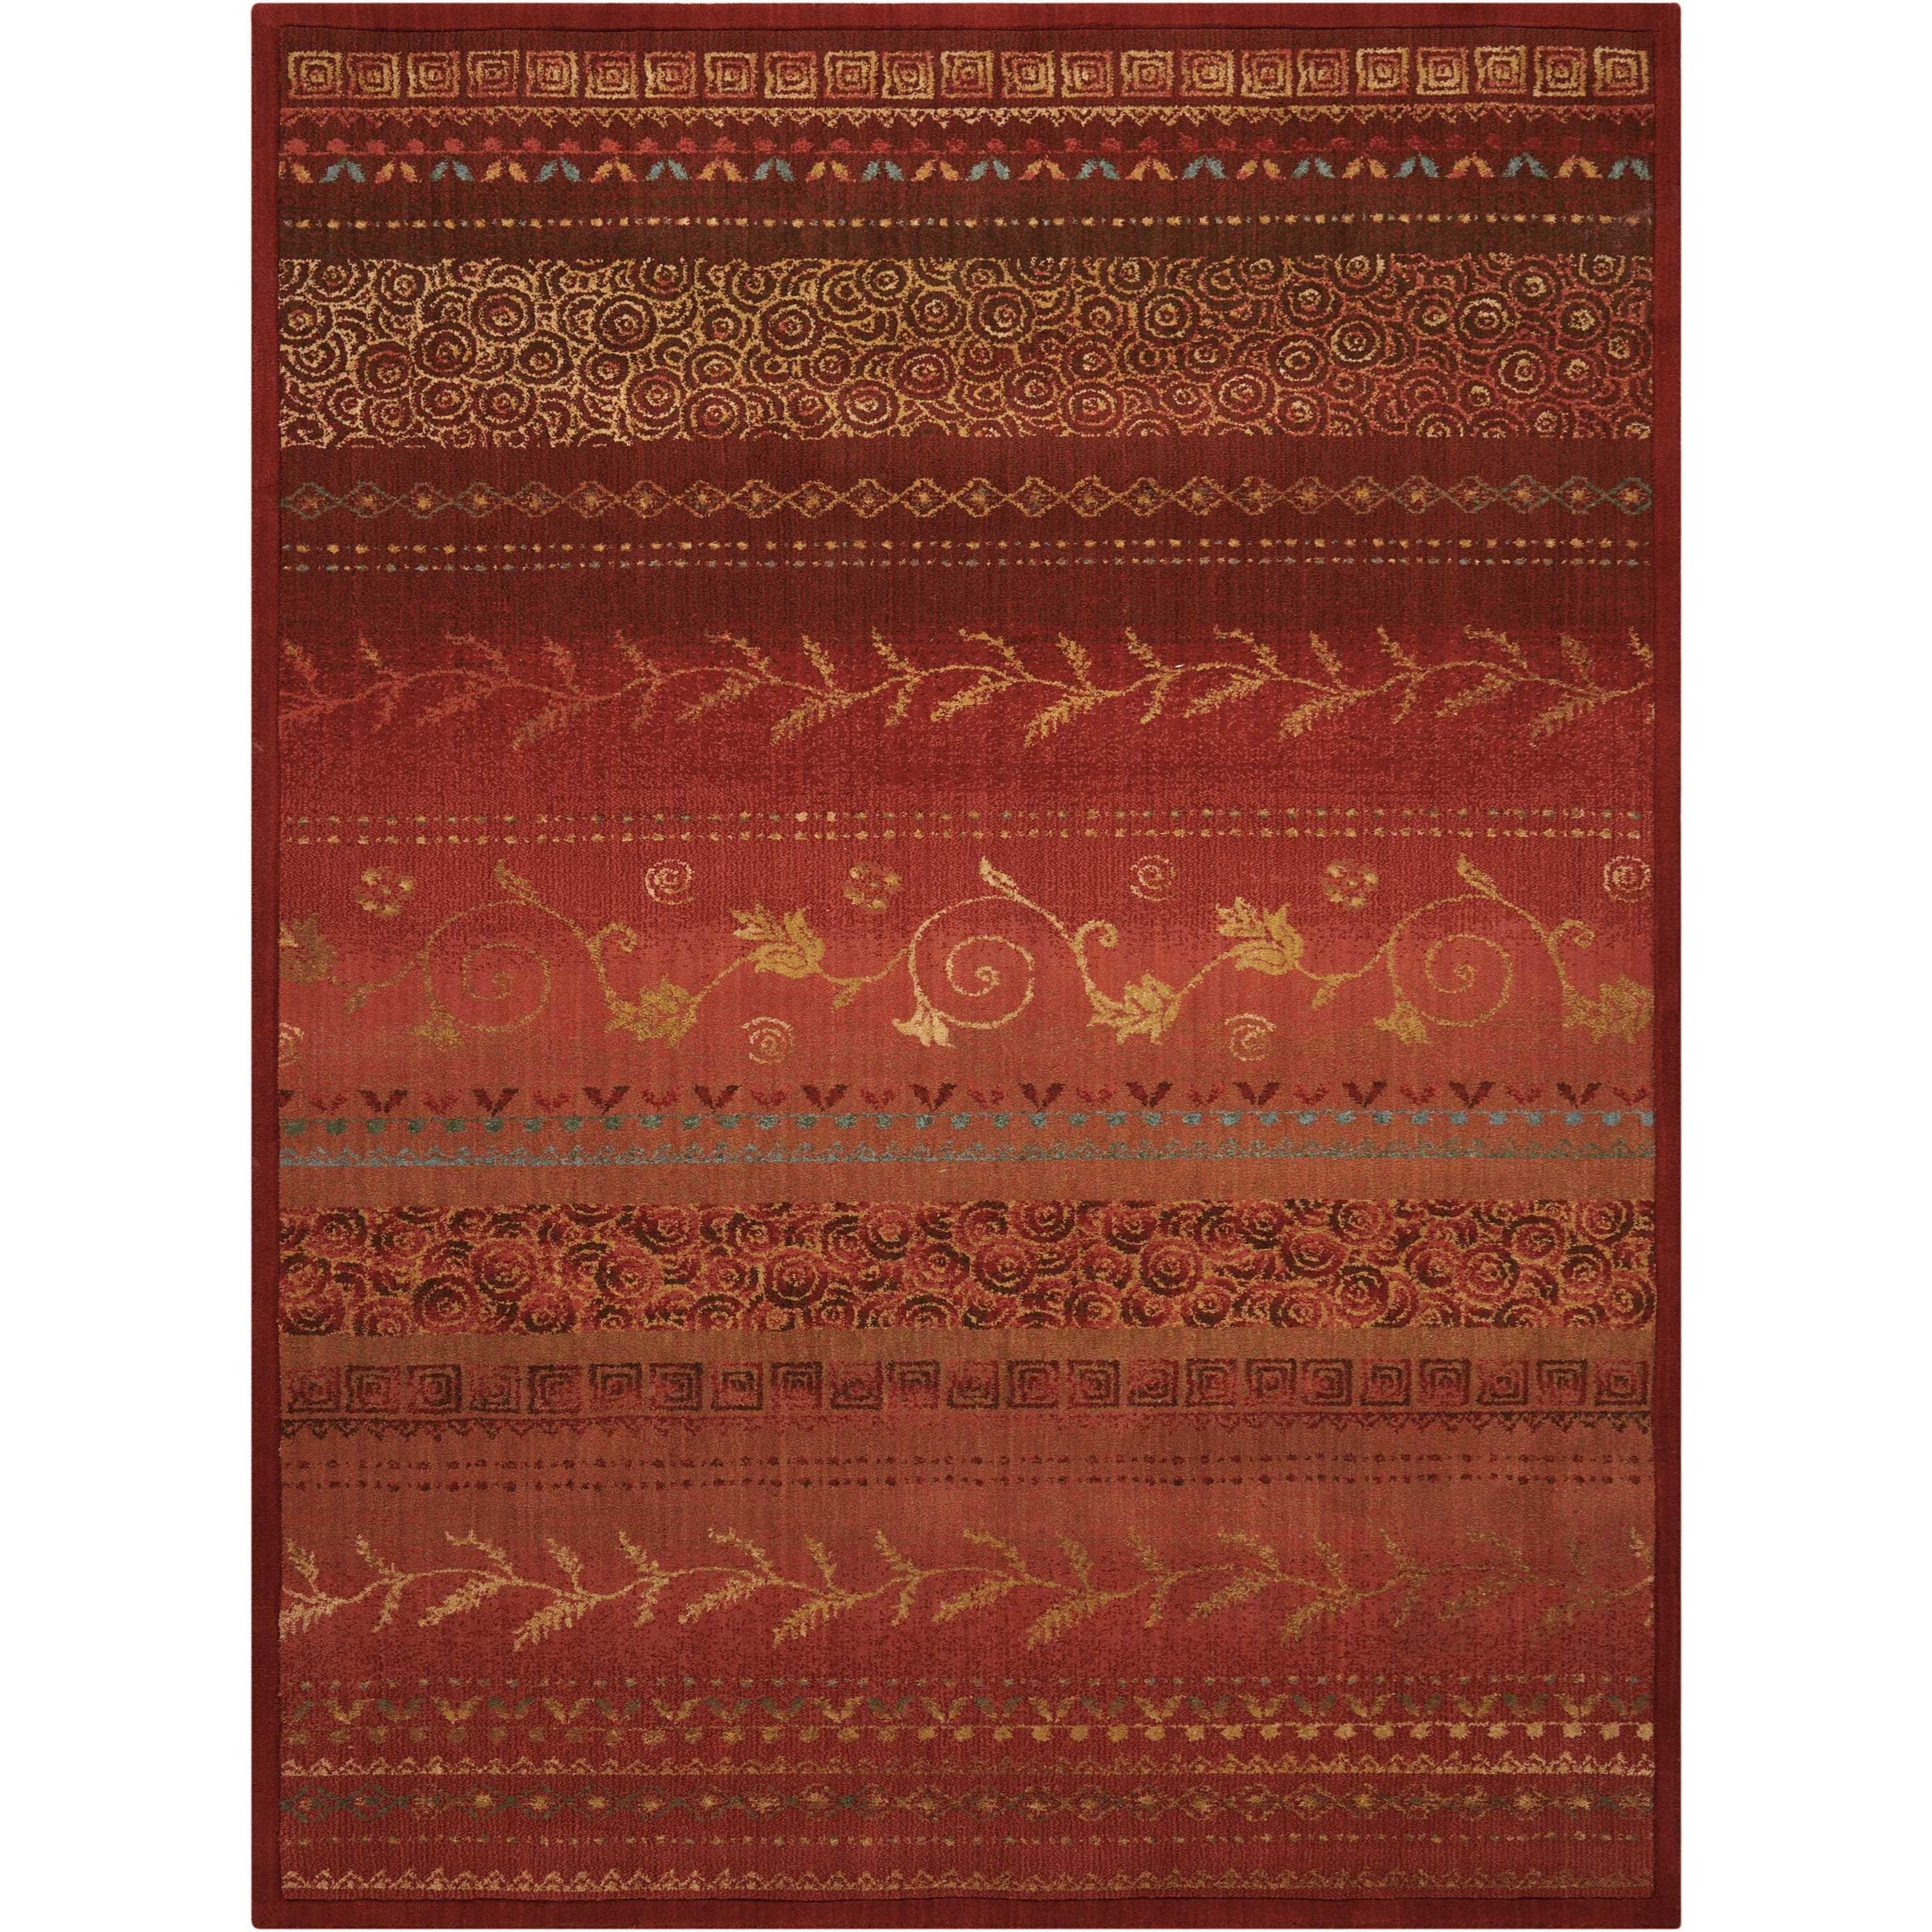 "Radiant Impression 5'6"" x 7'5"" Crimson Rectangle Rug by Nourison at Sprintz Furniture"